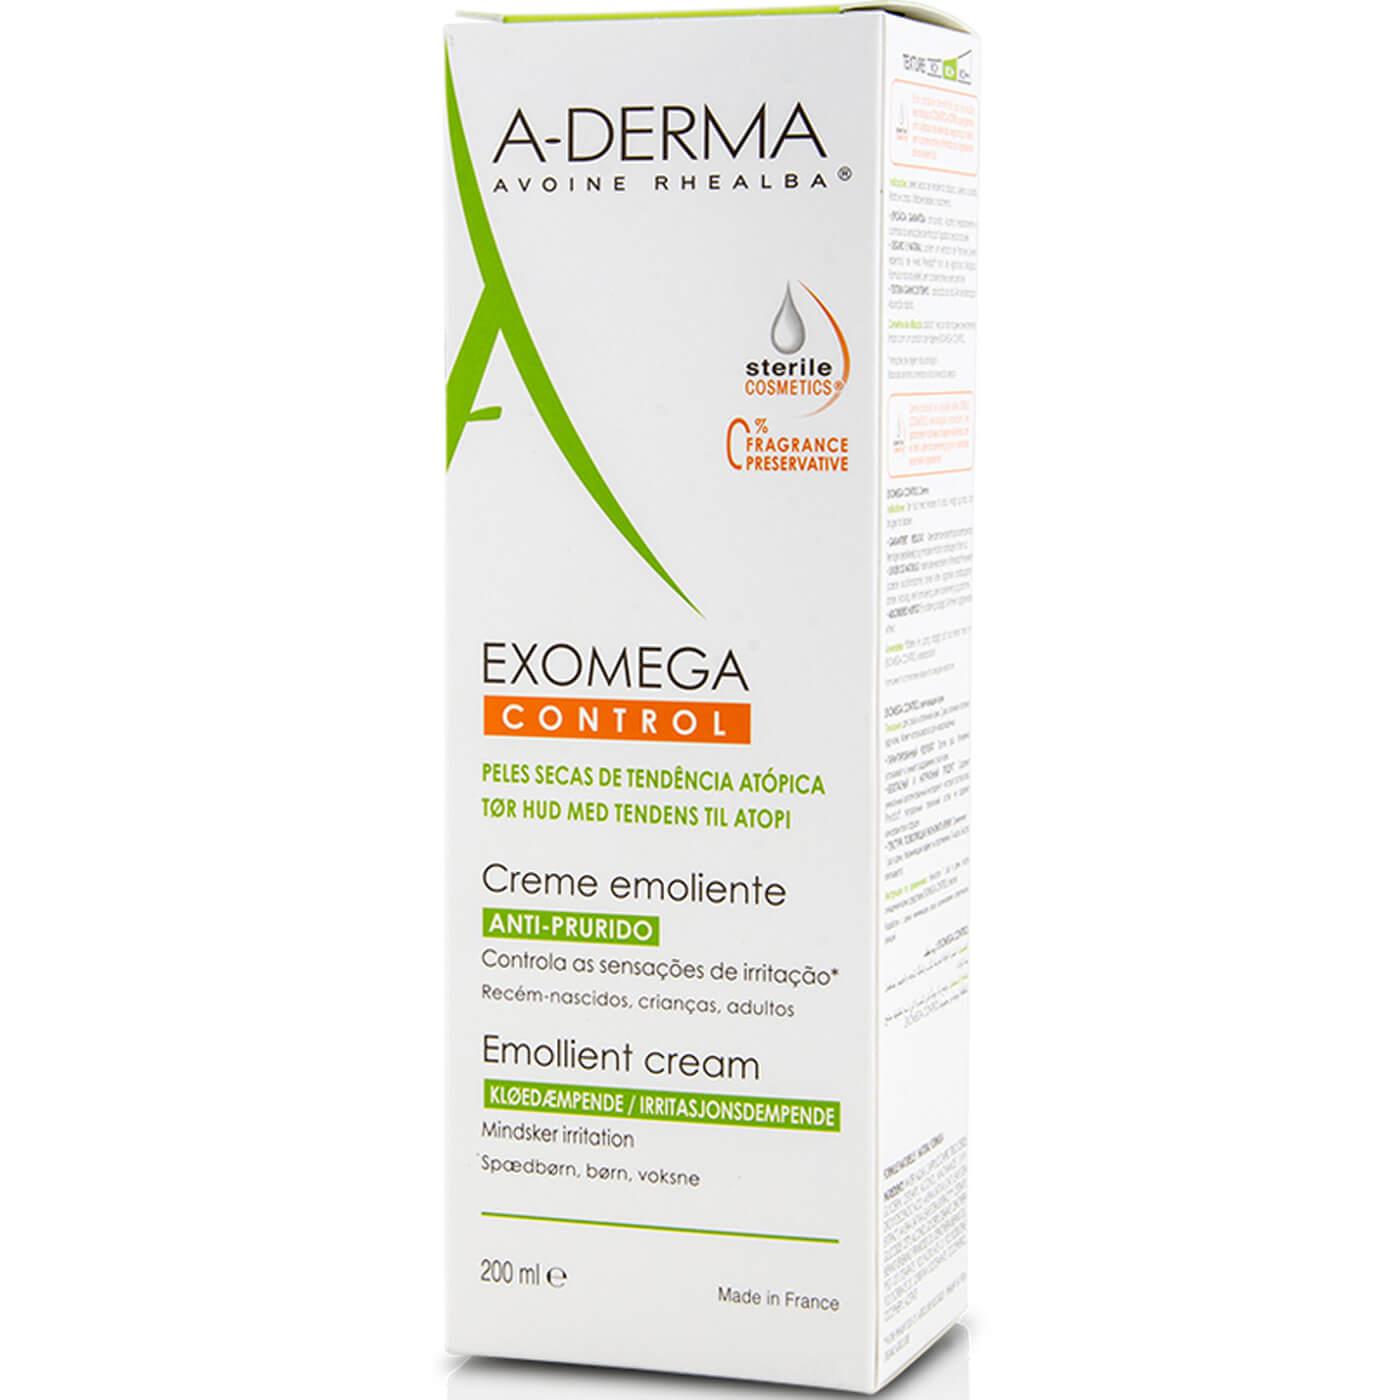 A-Derma Exomega Control Cream Emollient Μαλακτική Κρέμα για το Ατοπικό & Πολύ Ξηρό Δέρμα με Αίσθηση Δυσανεξίας 200ml